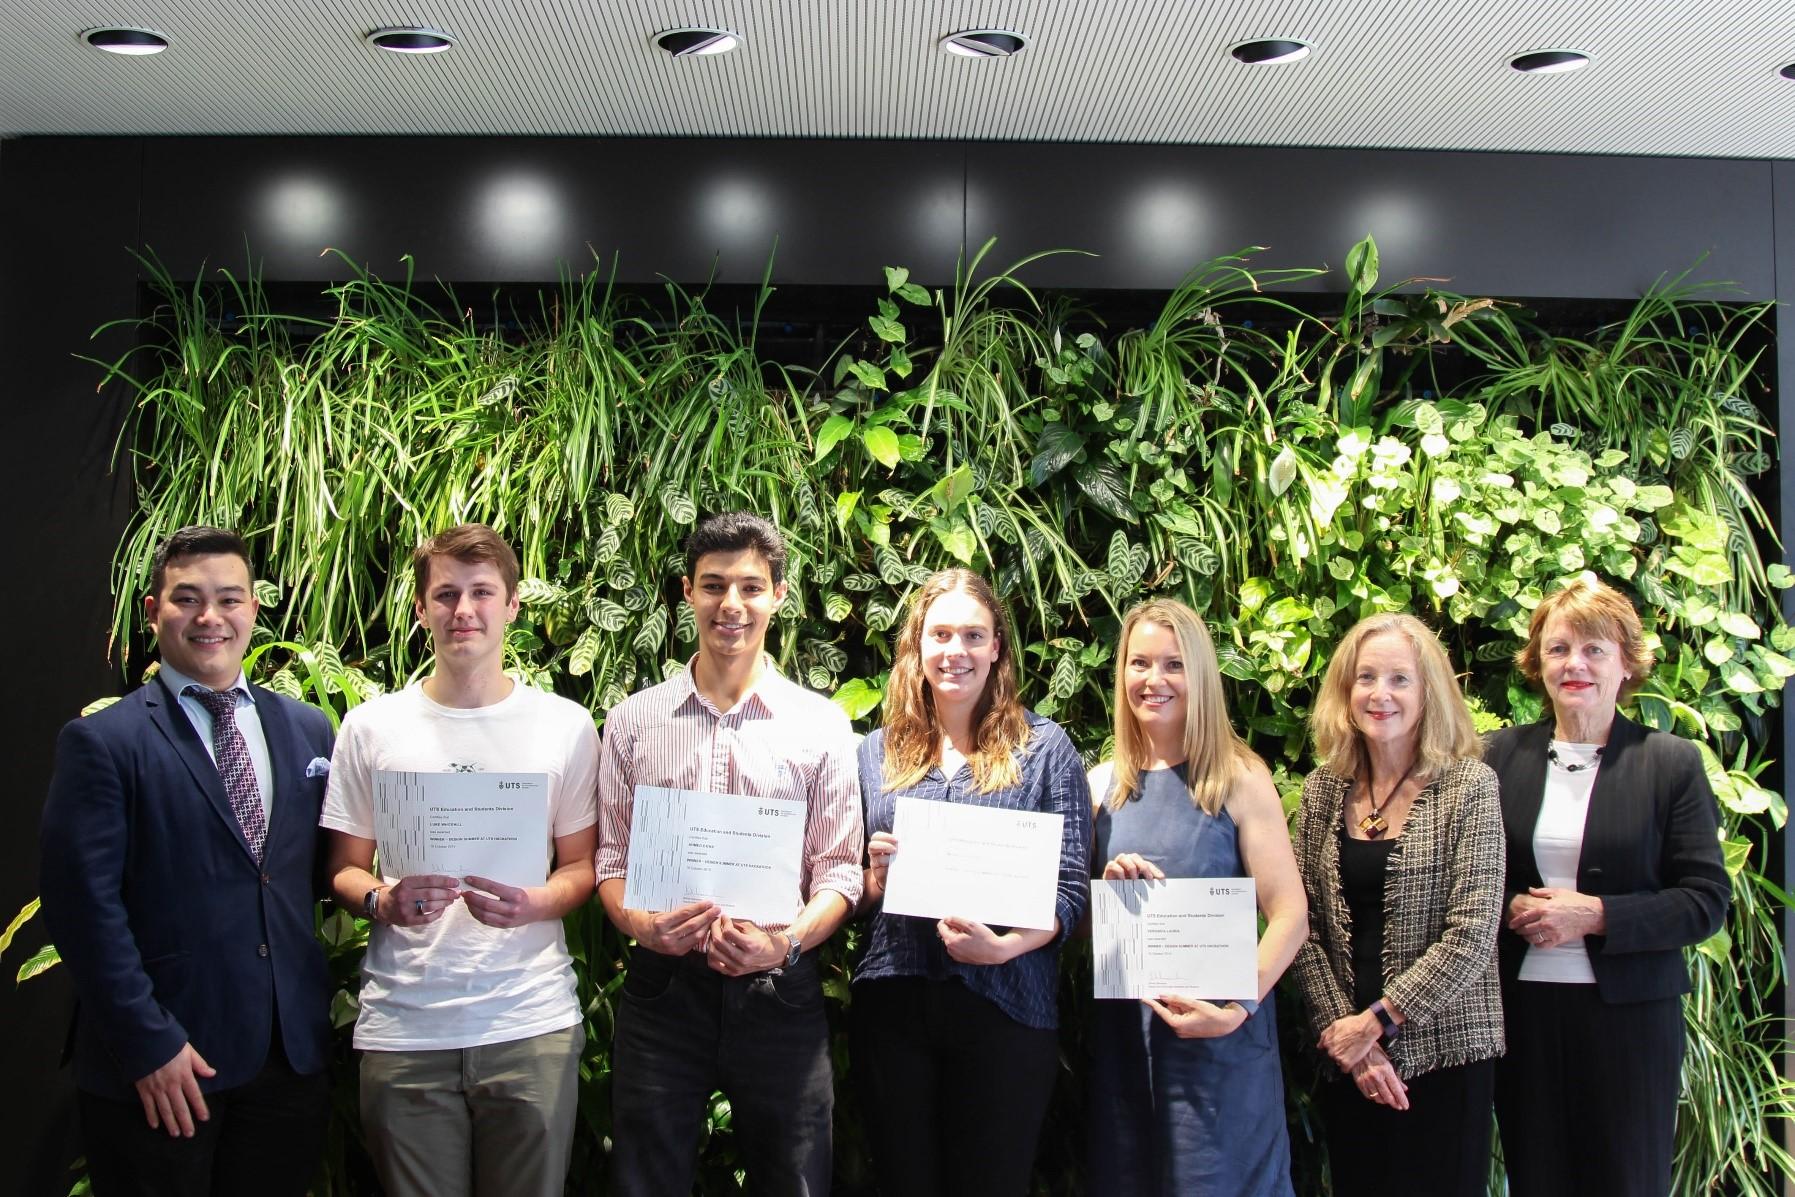 Winning team holding certificates